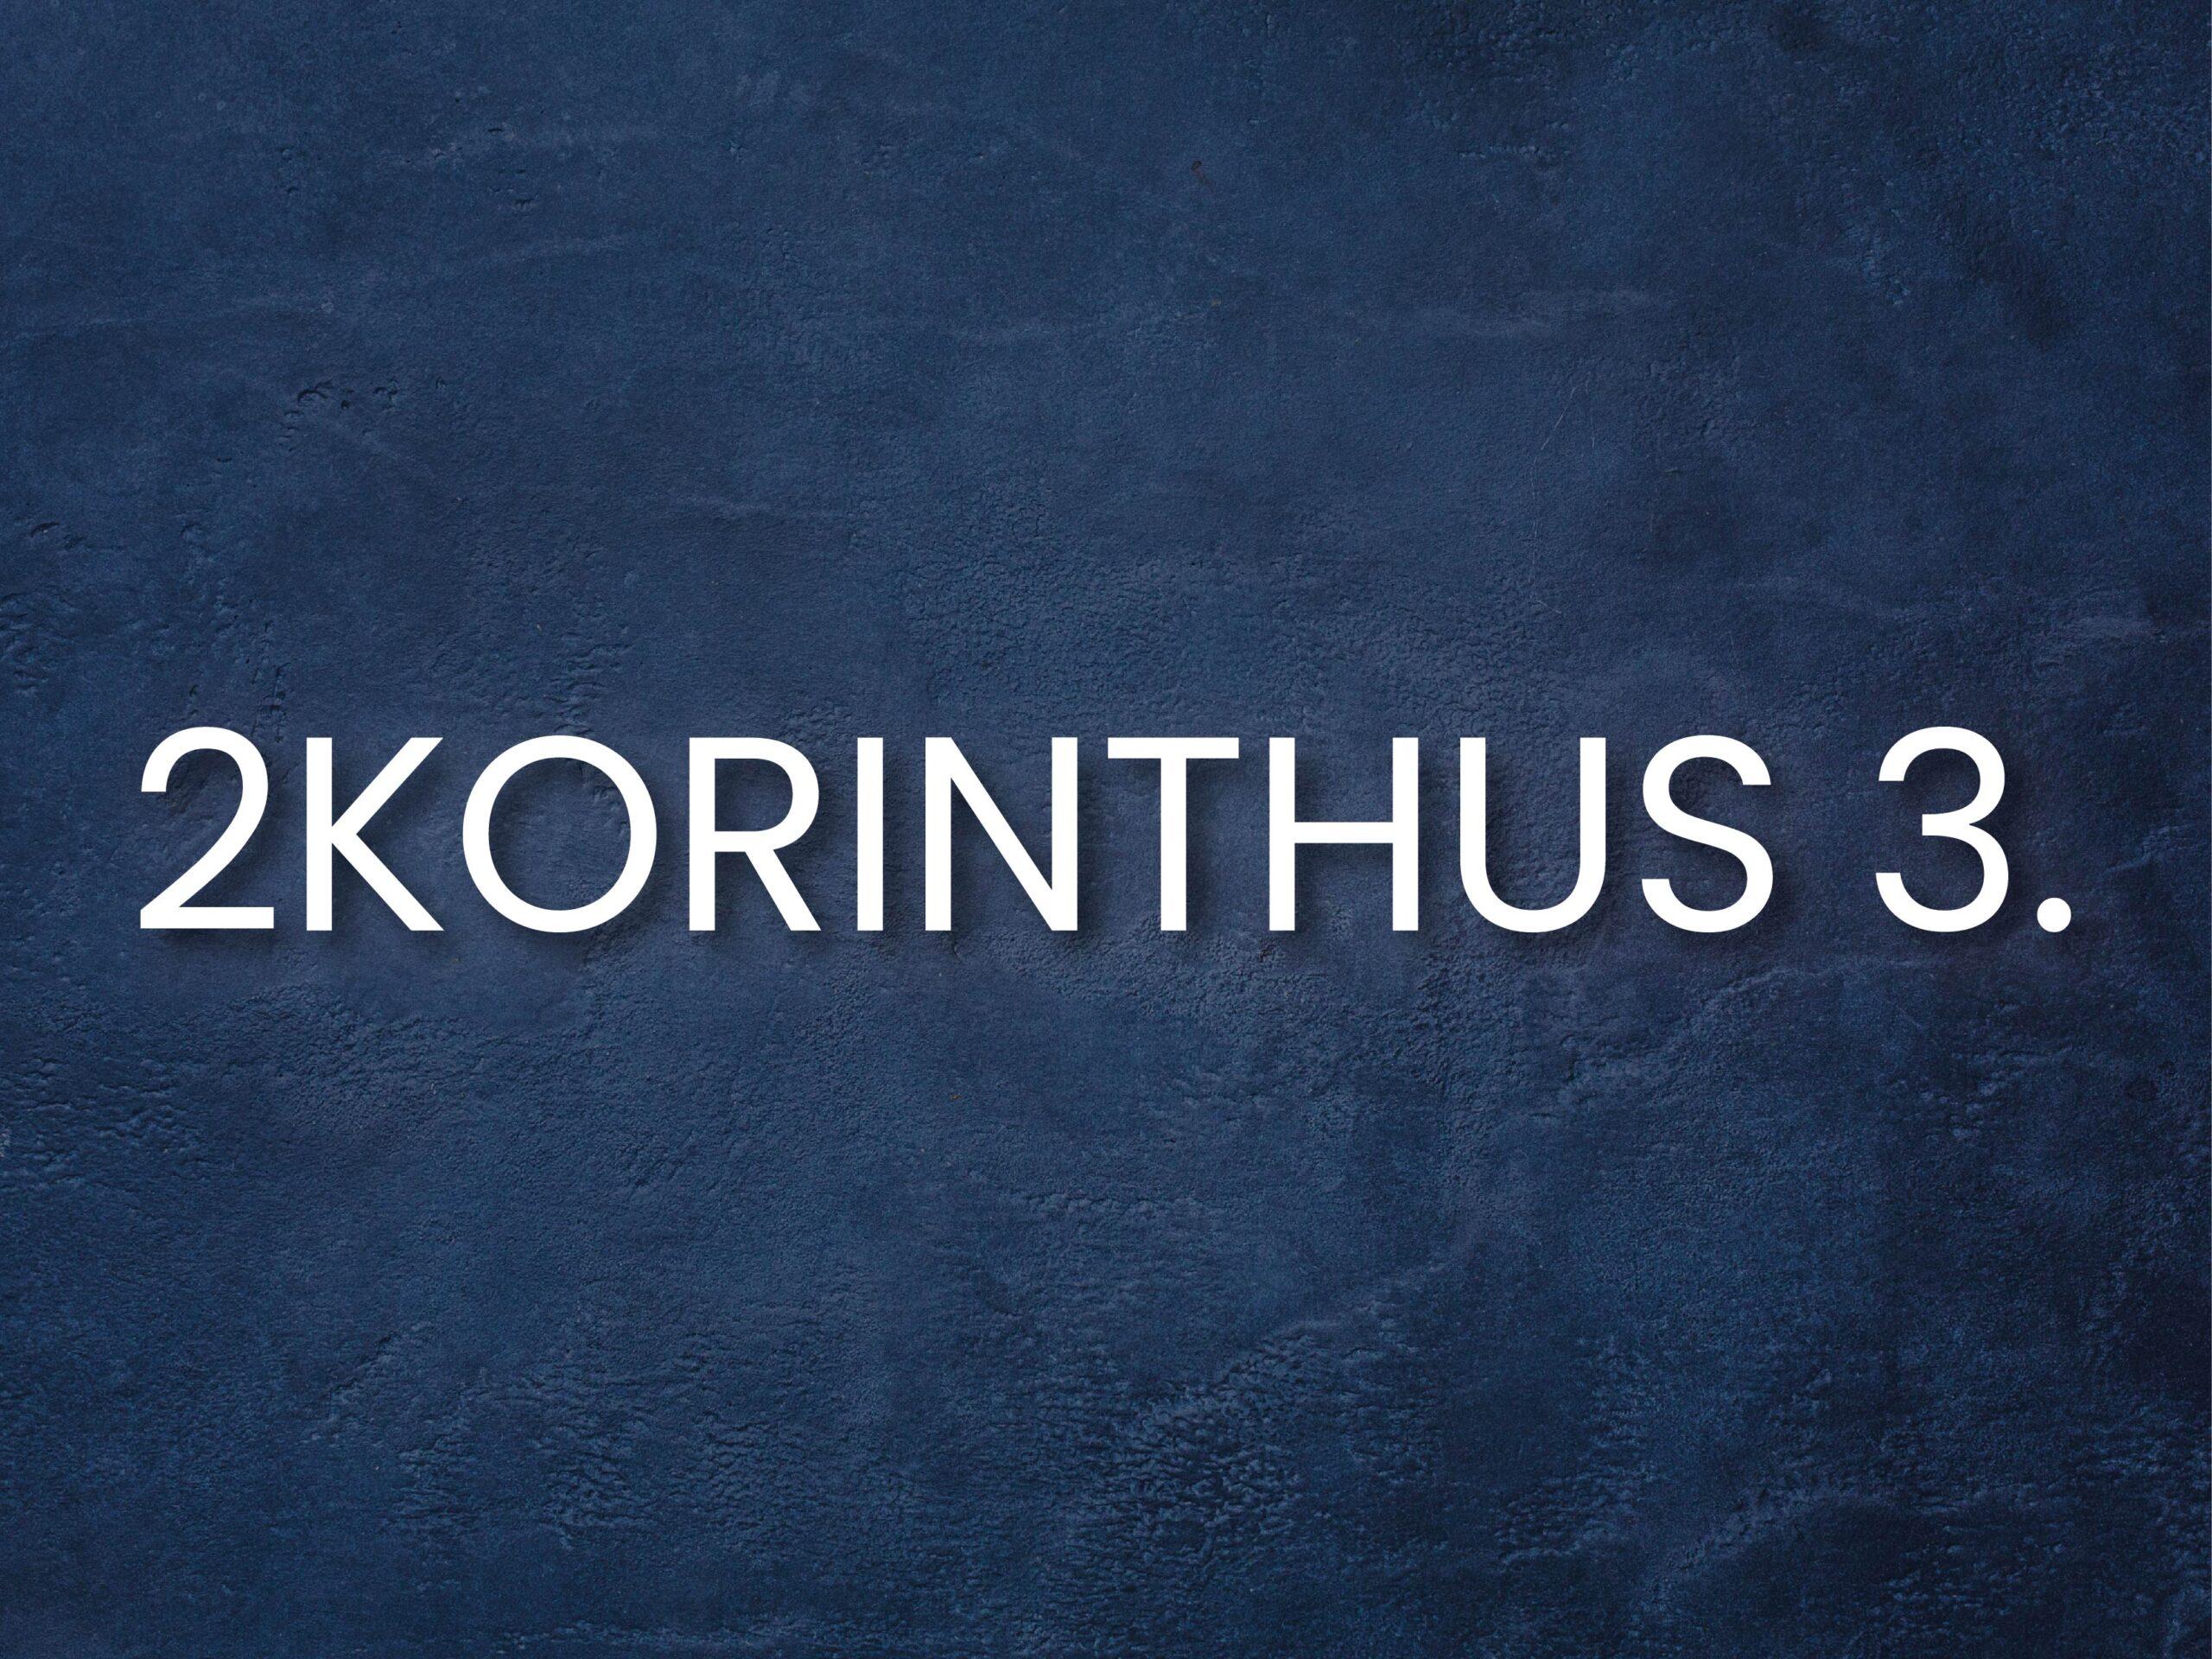 INFO_2korinthus_3